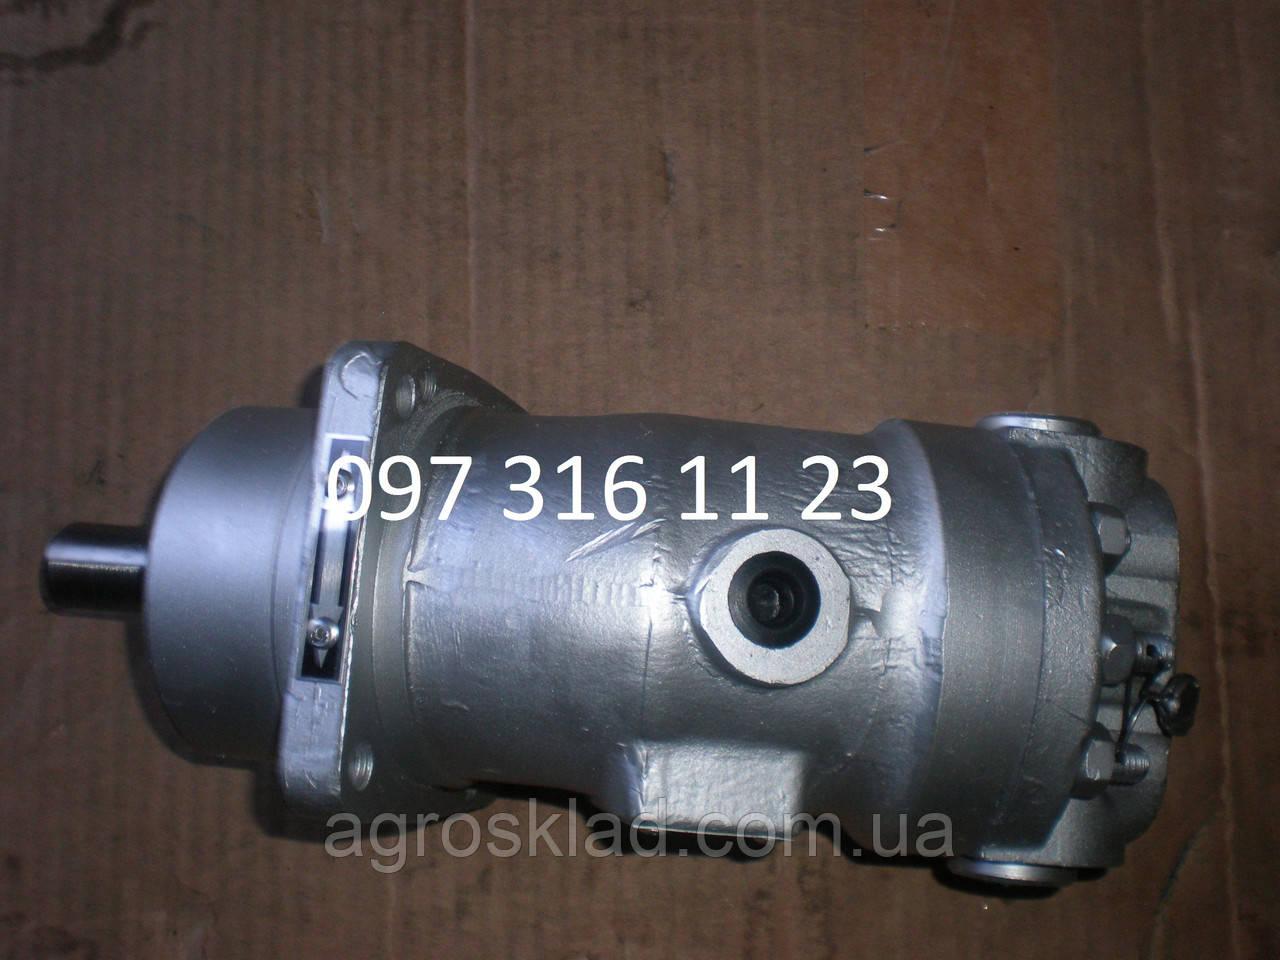 Гидромоторы 210.12.01.03